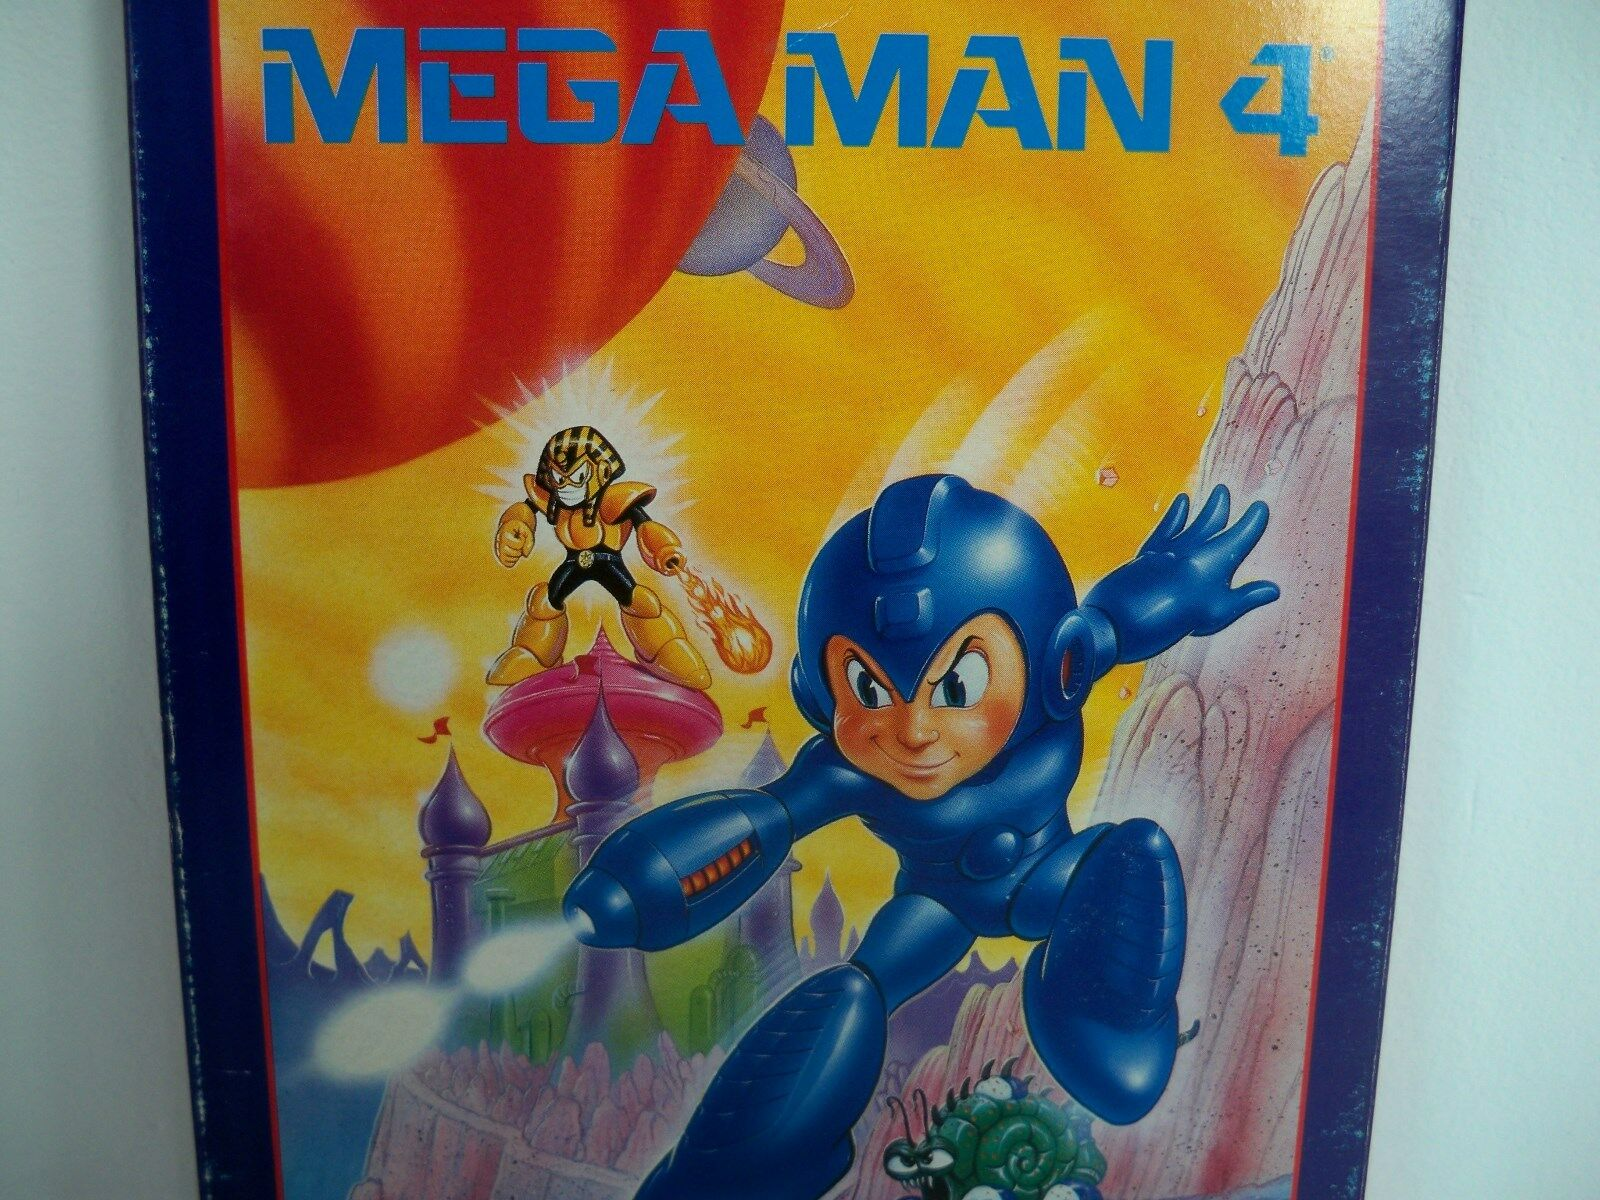 D0526601 MEGA MAN 4 NES 100% WORKING BOX PLASTIC CASE DUST COVER